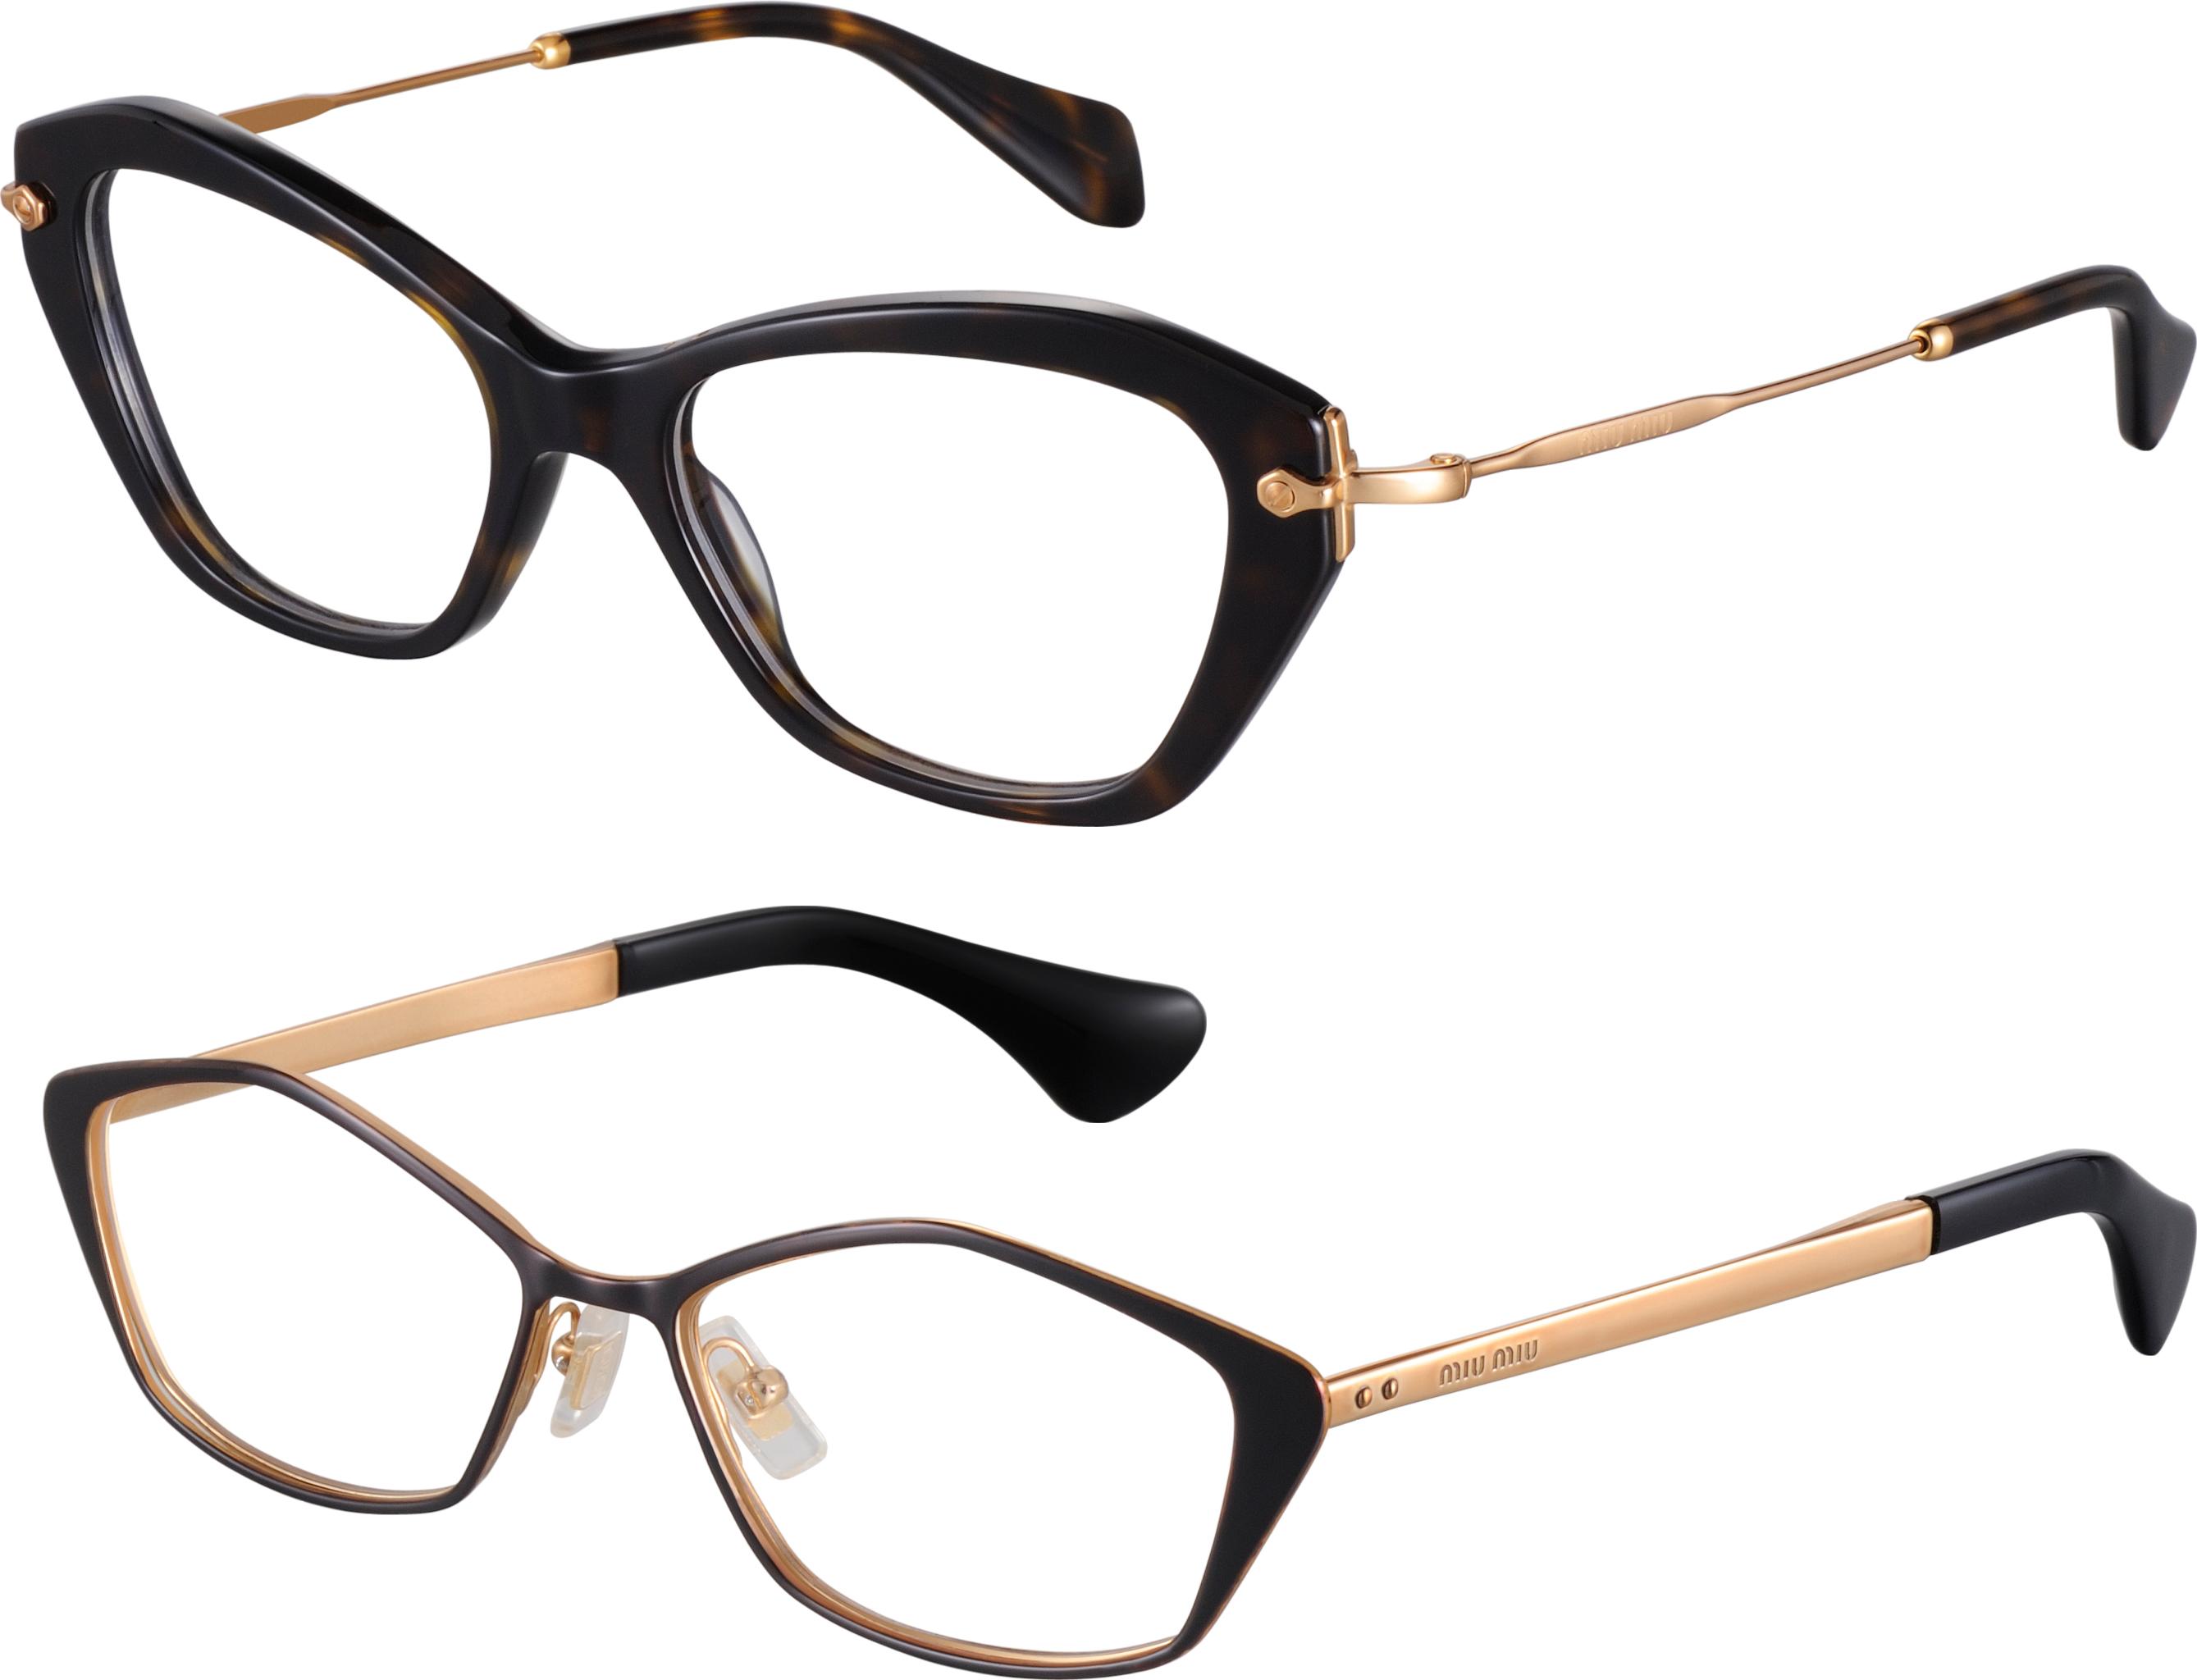 Glasses Png Image Glasses Eyeglasses Mirrored Sunglasses